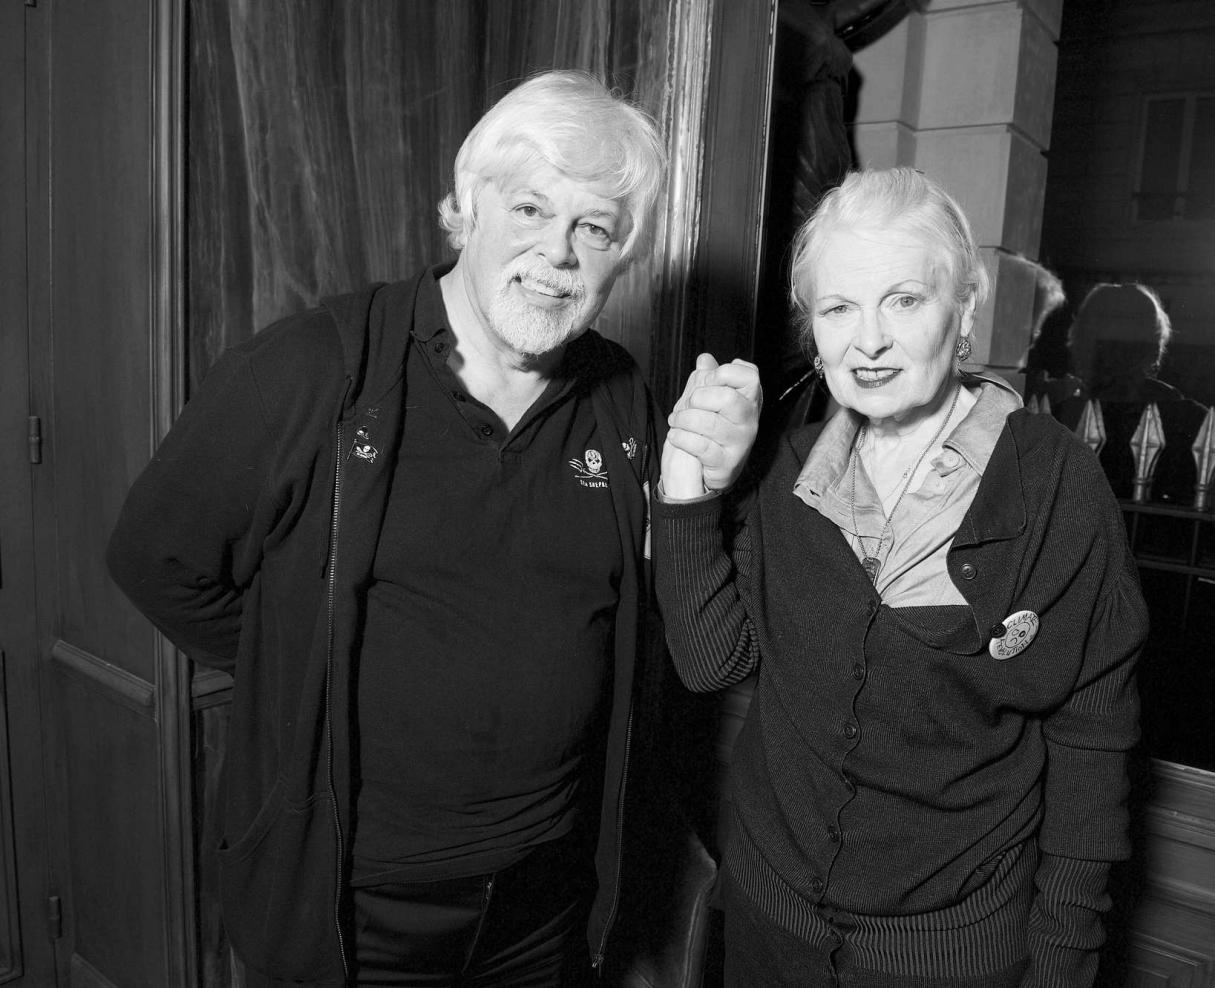 Paul Watson and Vivienne Westwood